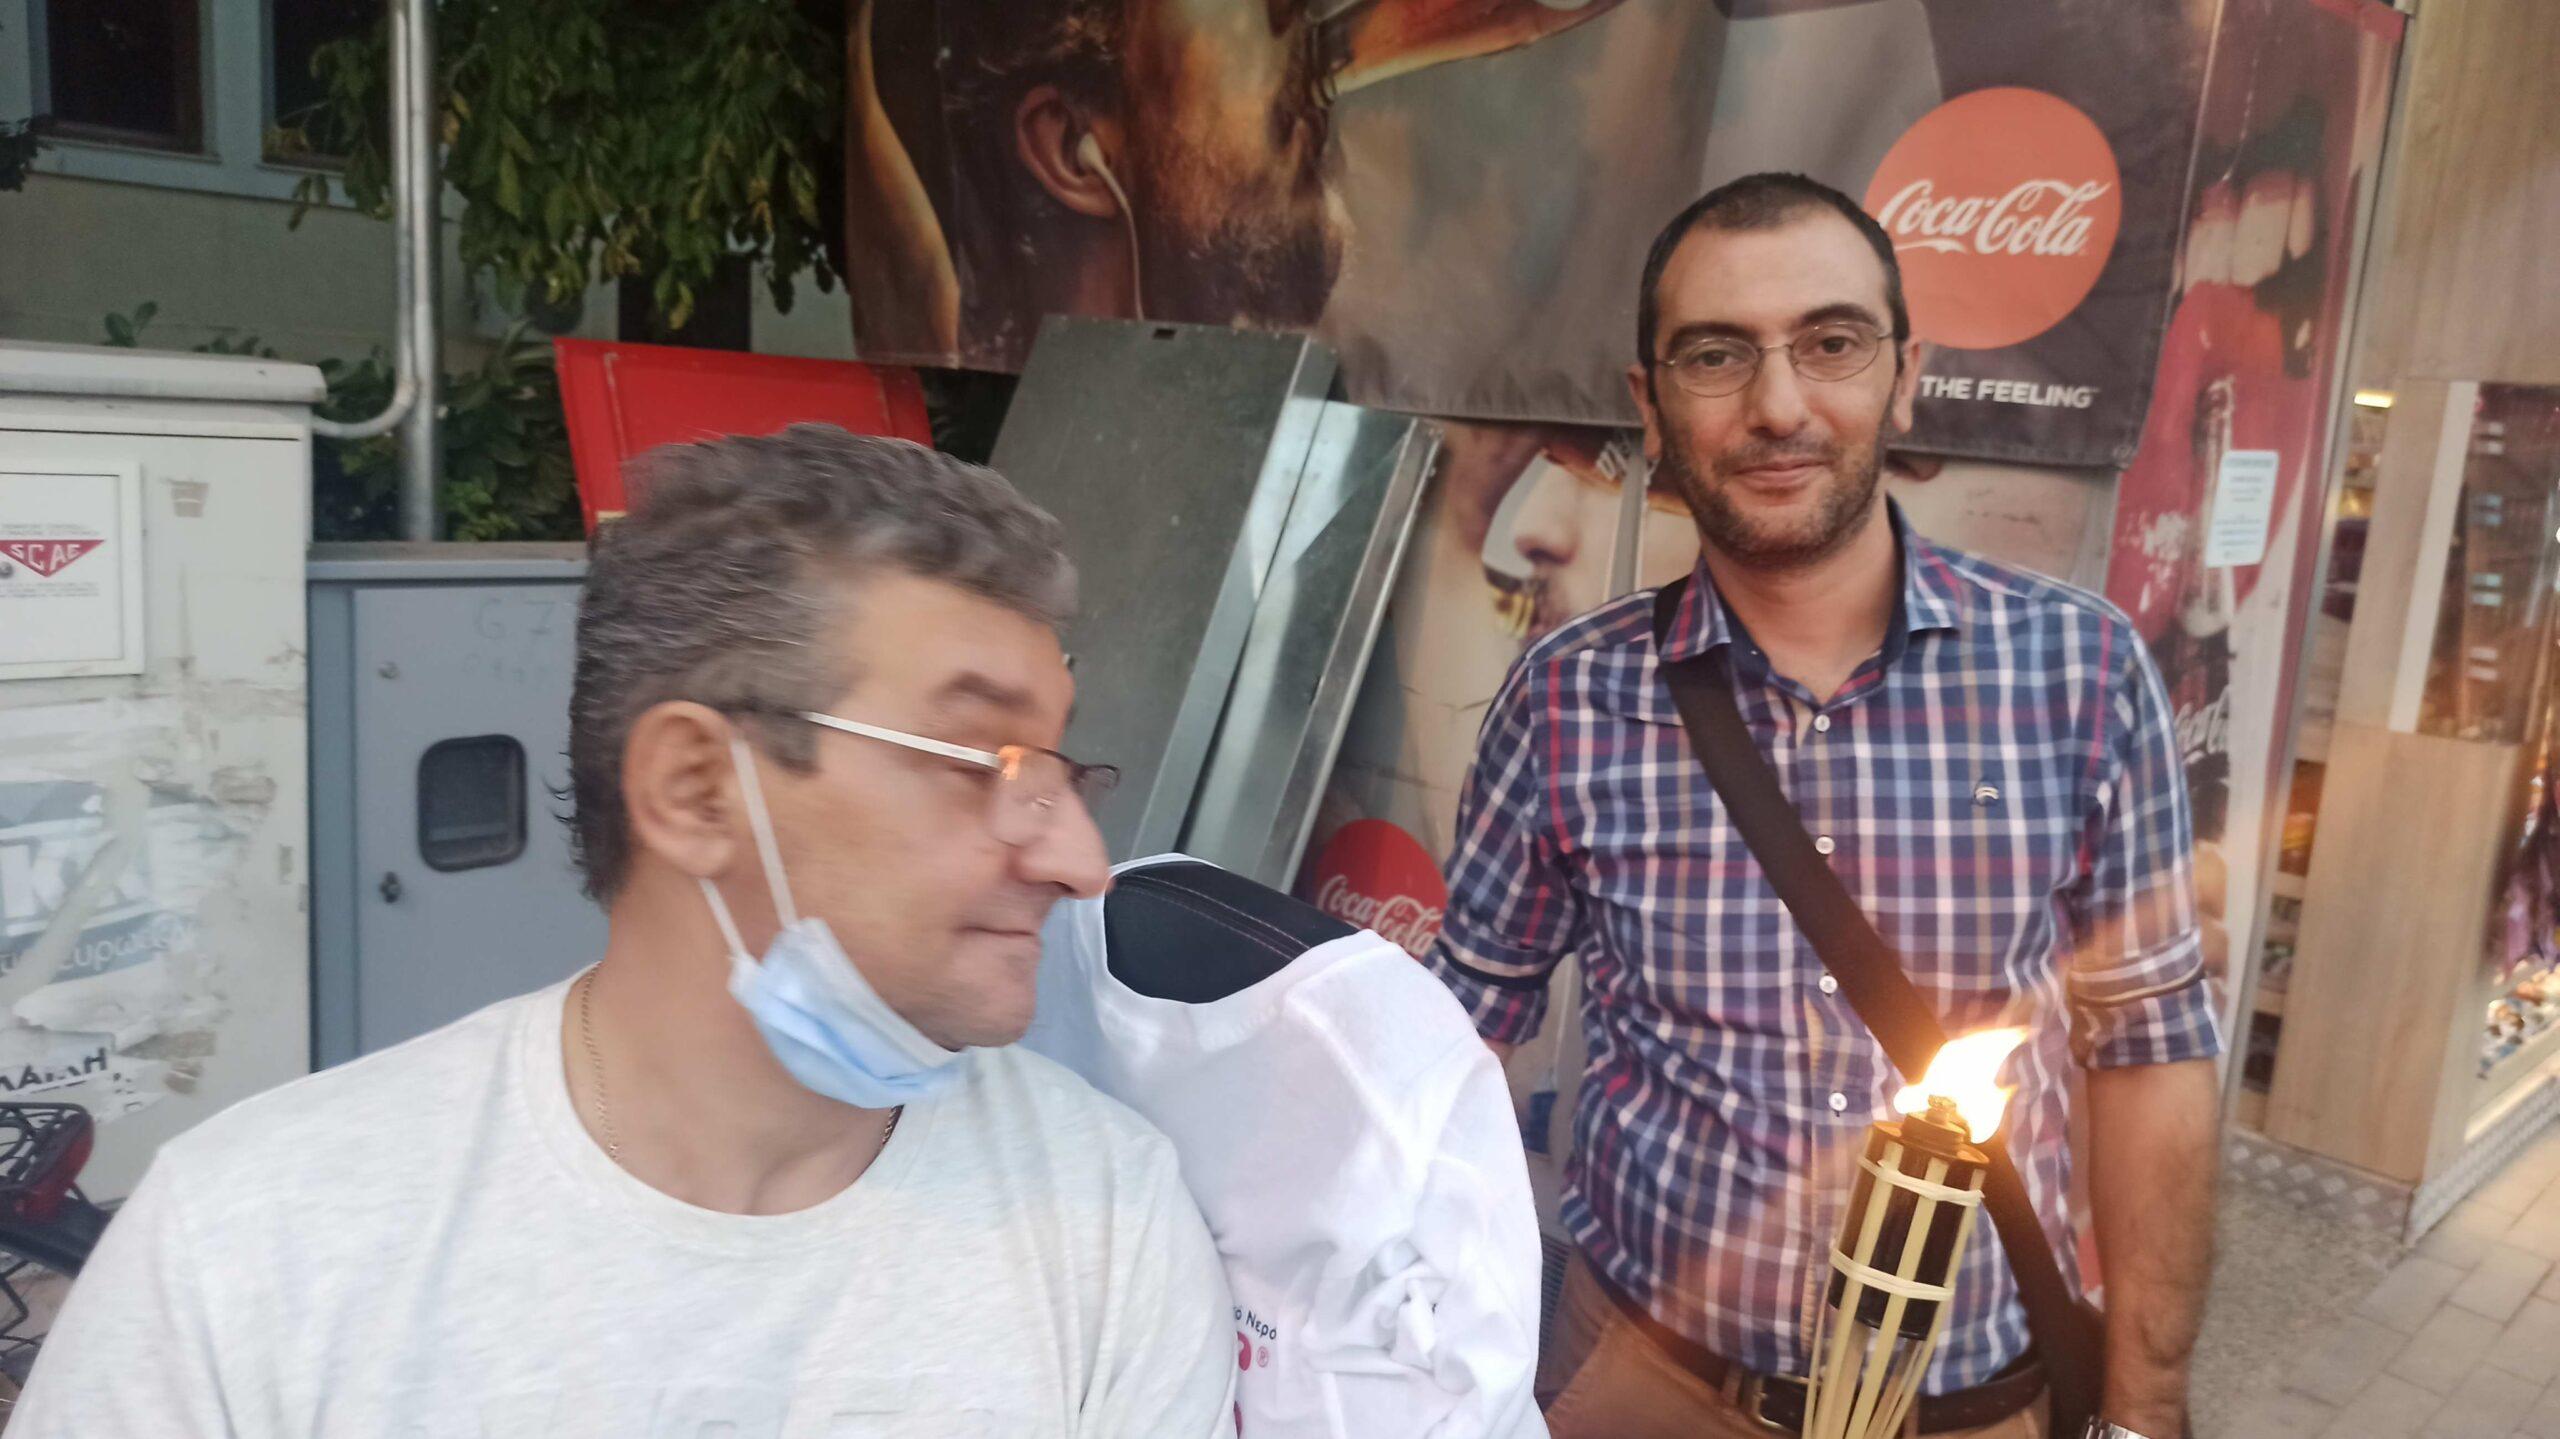 Eordaialive.com: O Δήμος Εορδαίας Συμμετείχε στην Ευρωπαϊκή Εβδομάδα Κινητικότητας (βίντεο-φωτο) 22